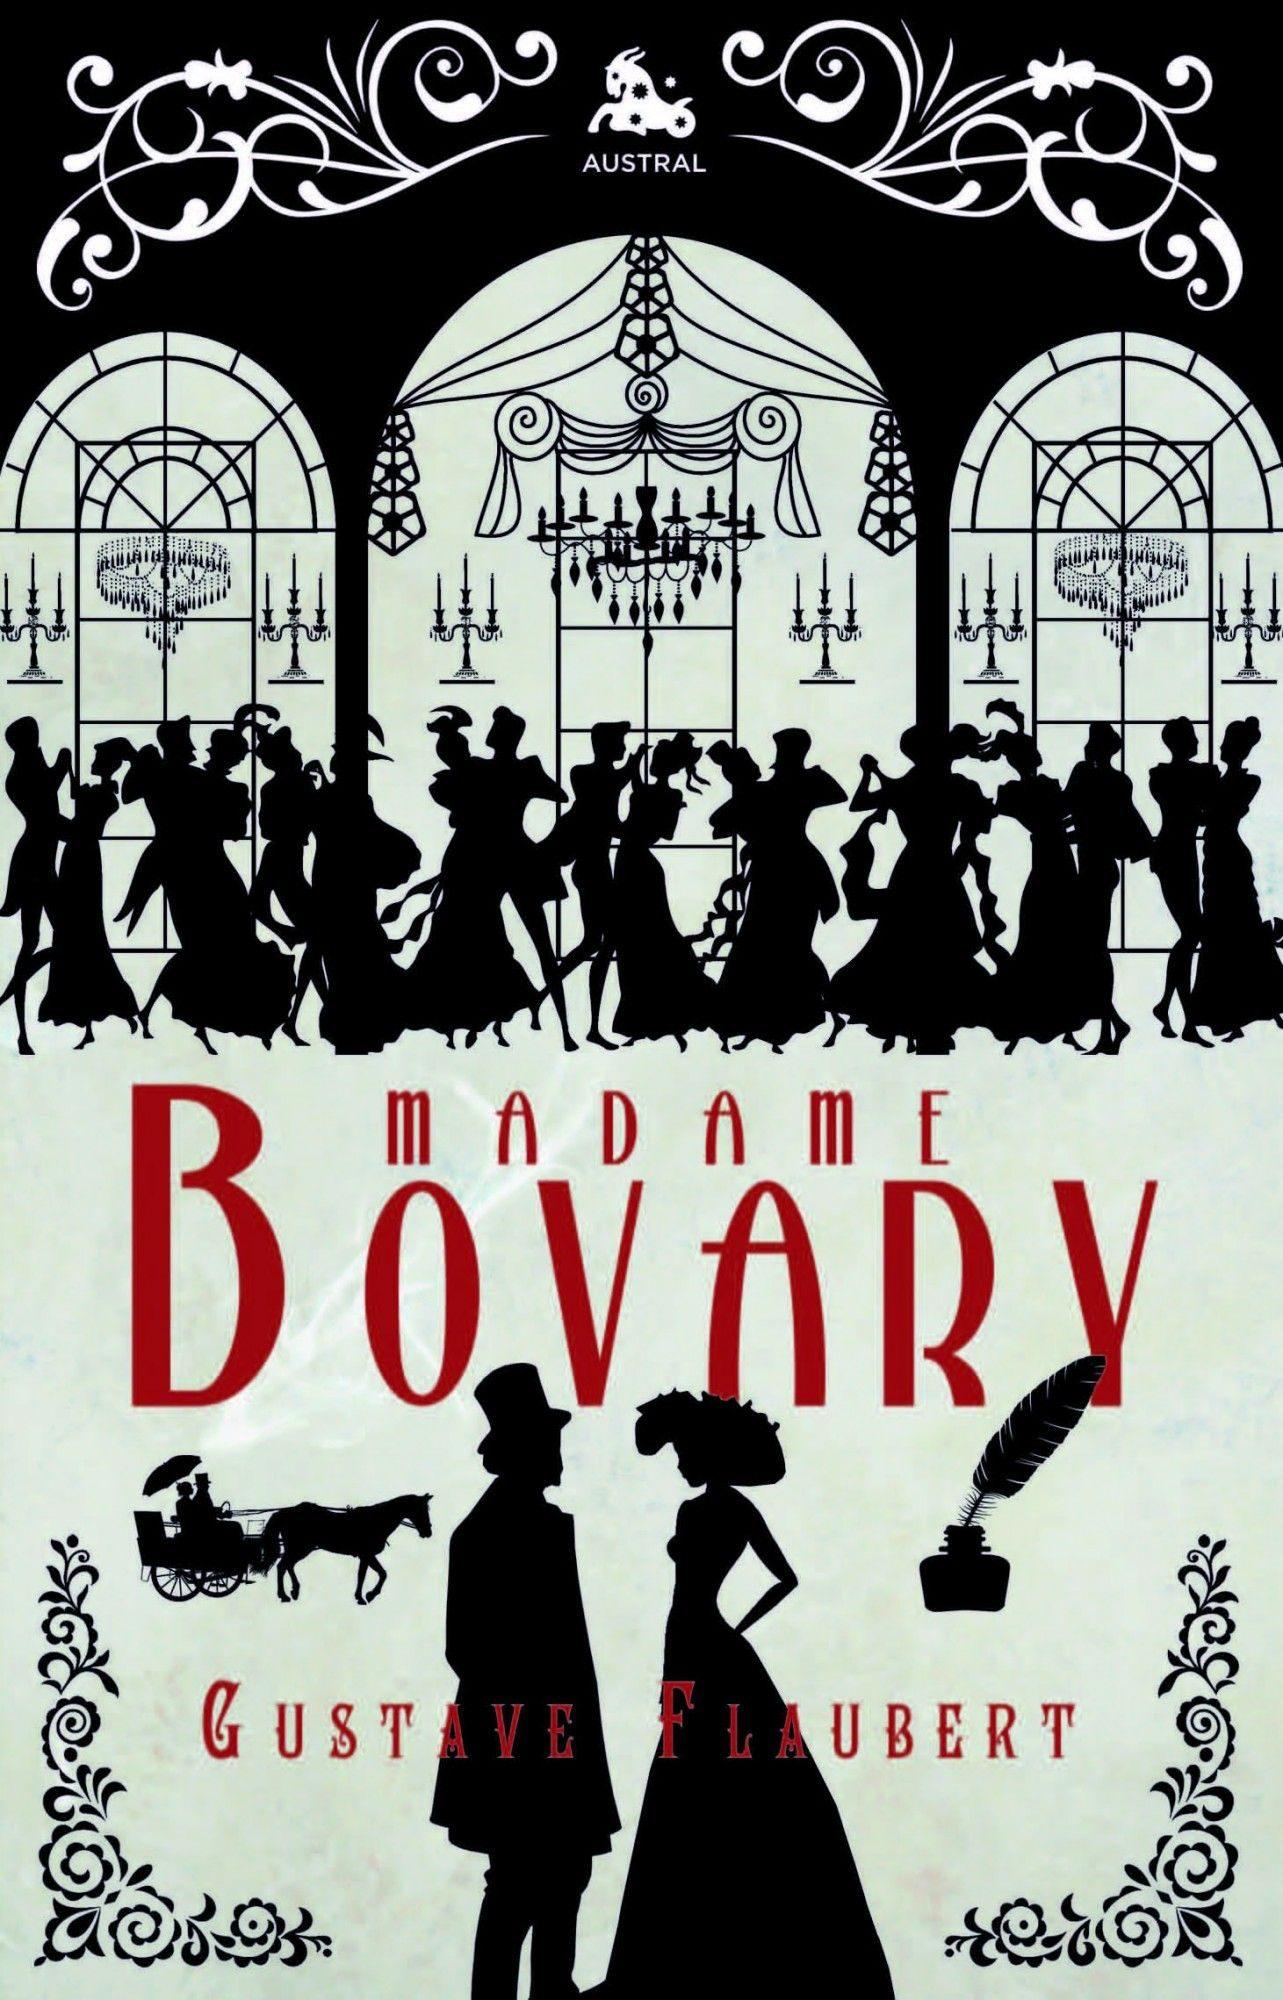 Madame bovary; gustave flaubert